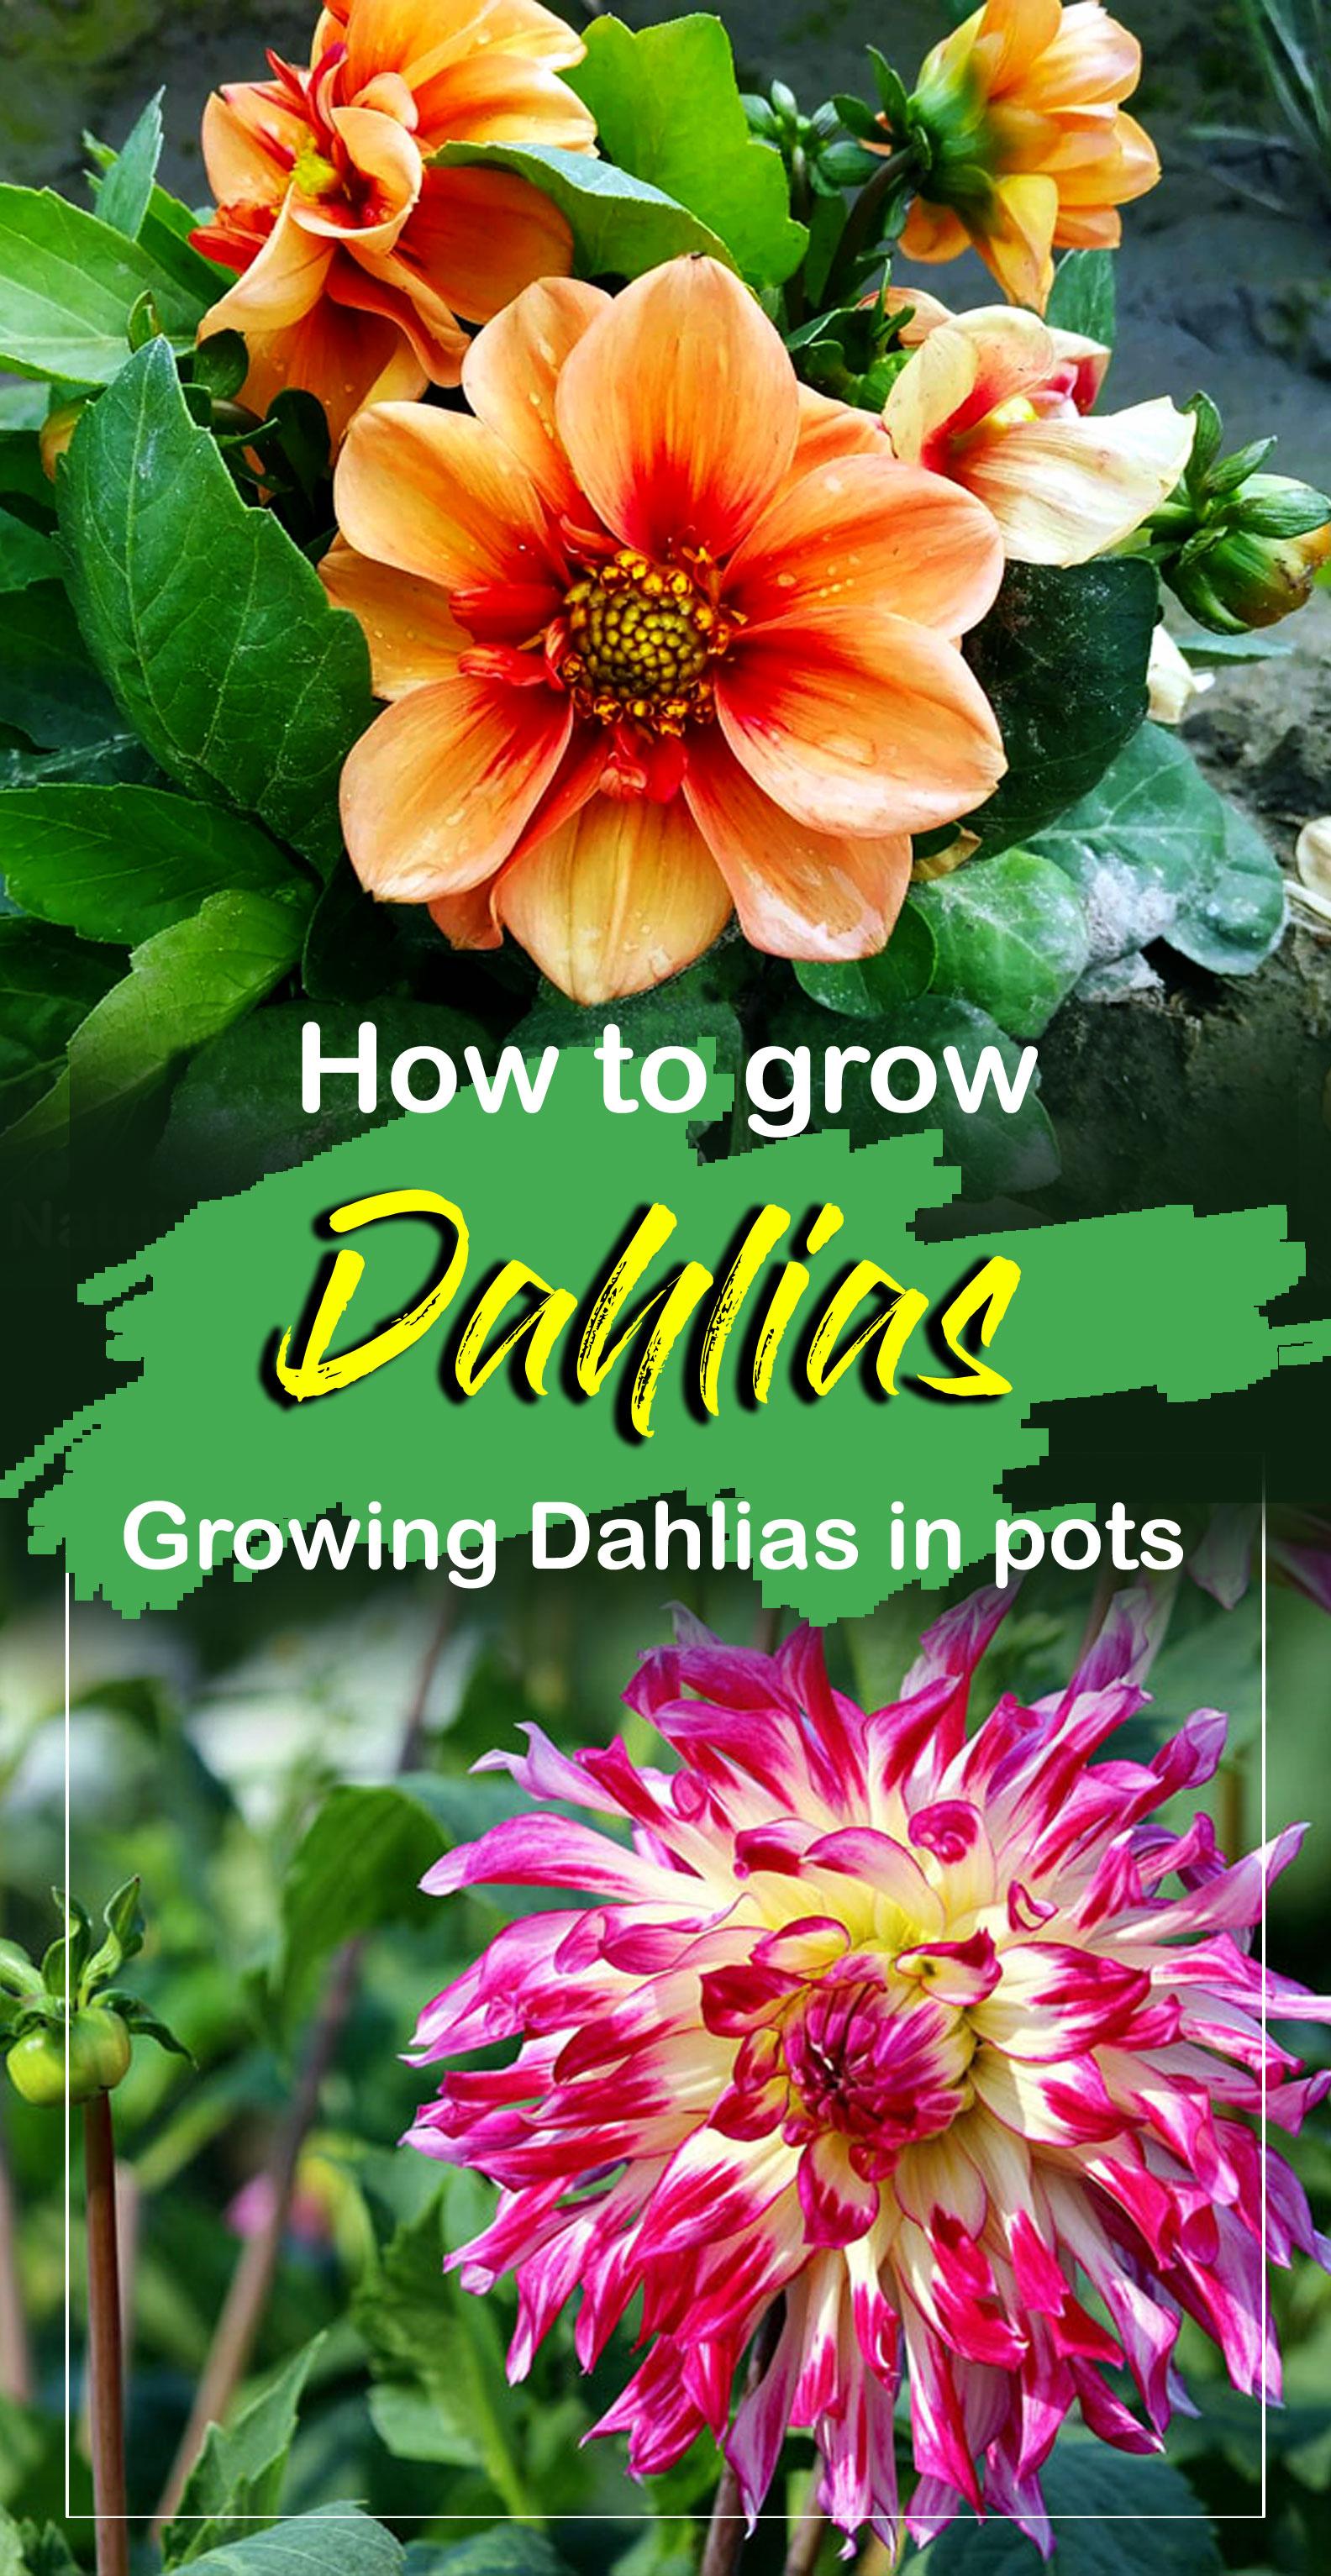 Dahlia plants | Growing dahlias